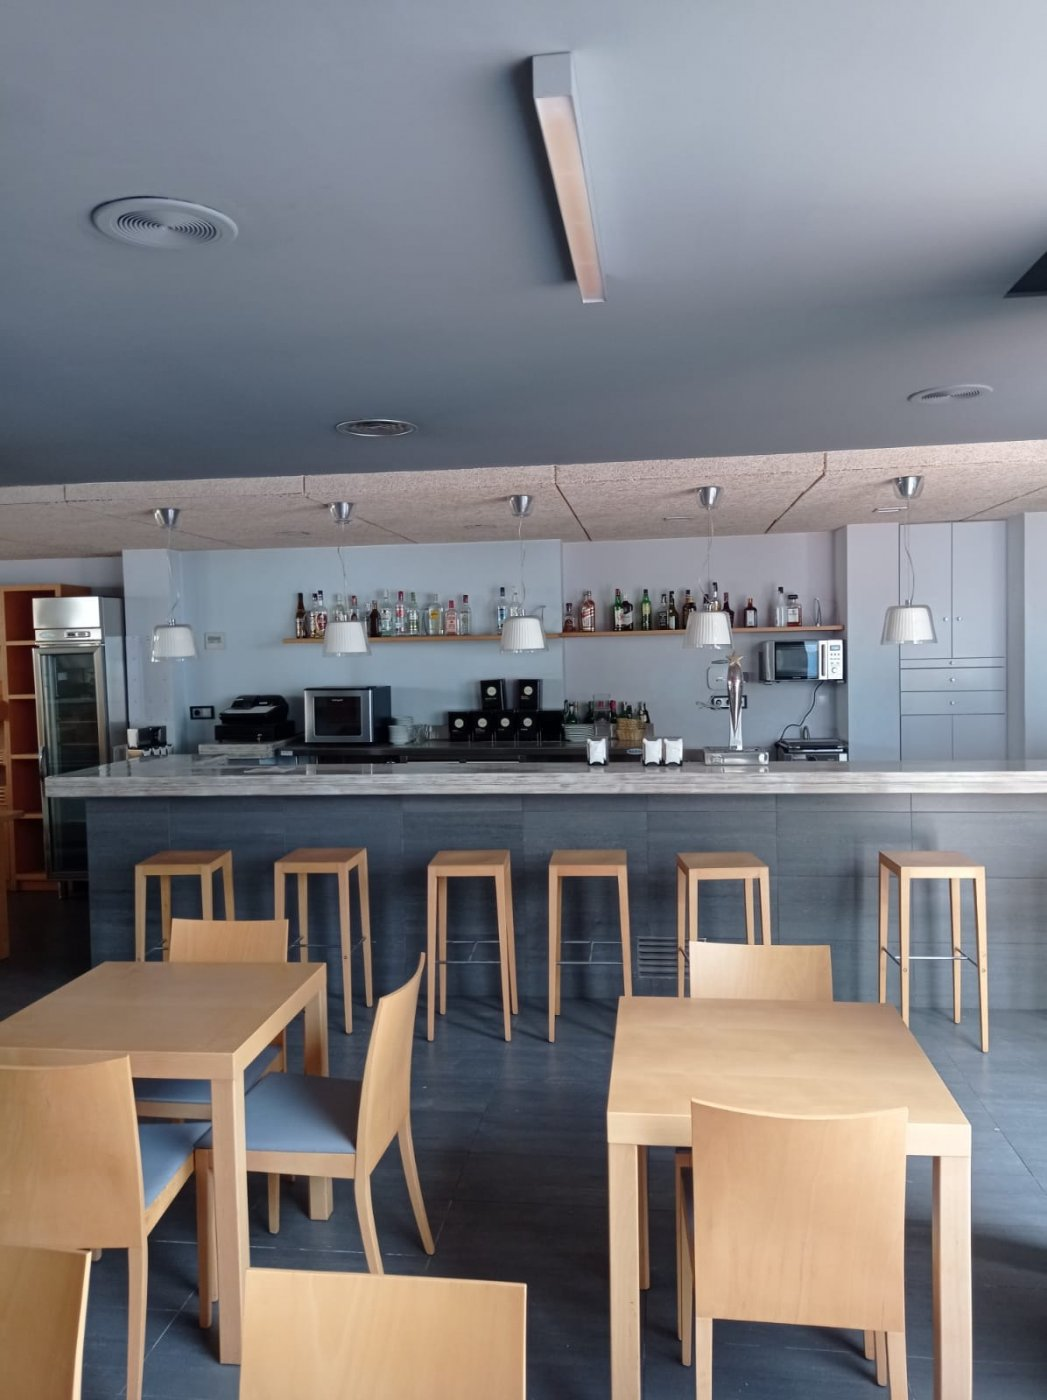 Venta o alquiler con opciÓn a compra de restaurante-bar en el centro de mahÓn totalmente e - imagenInmueble16